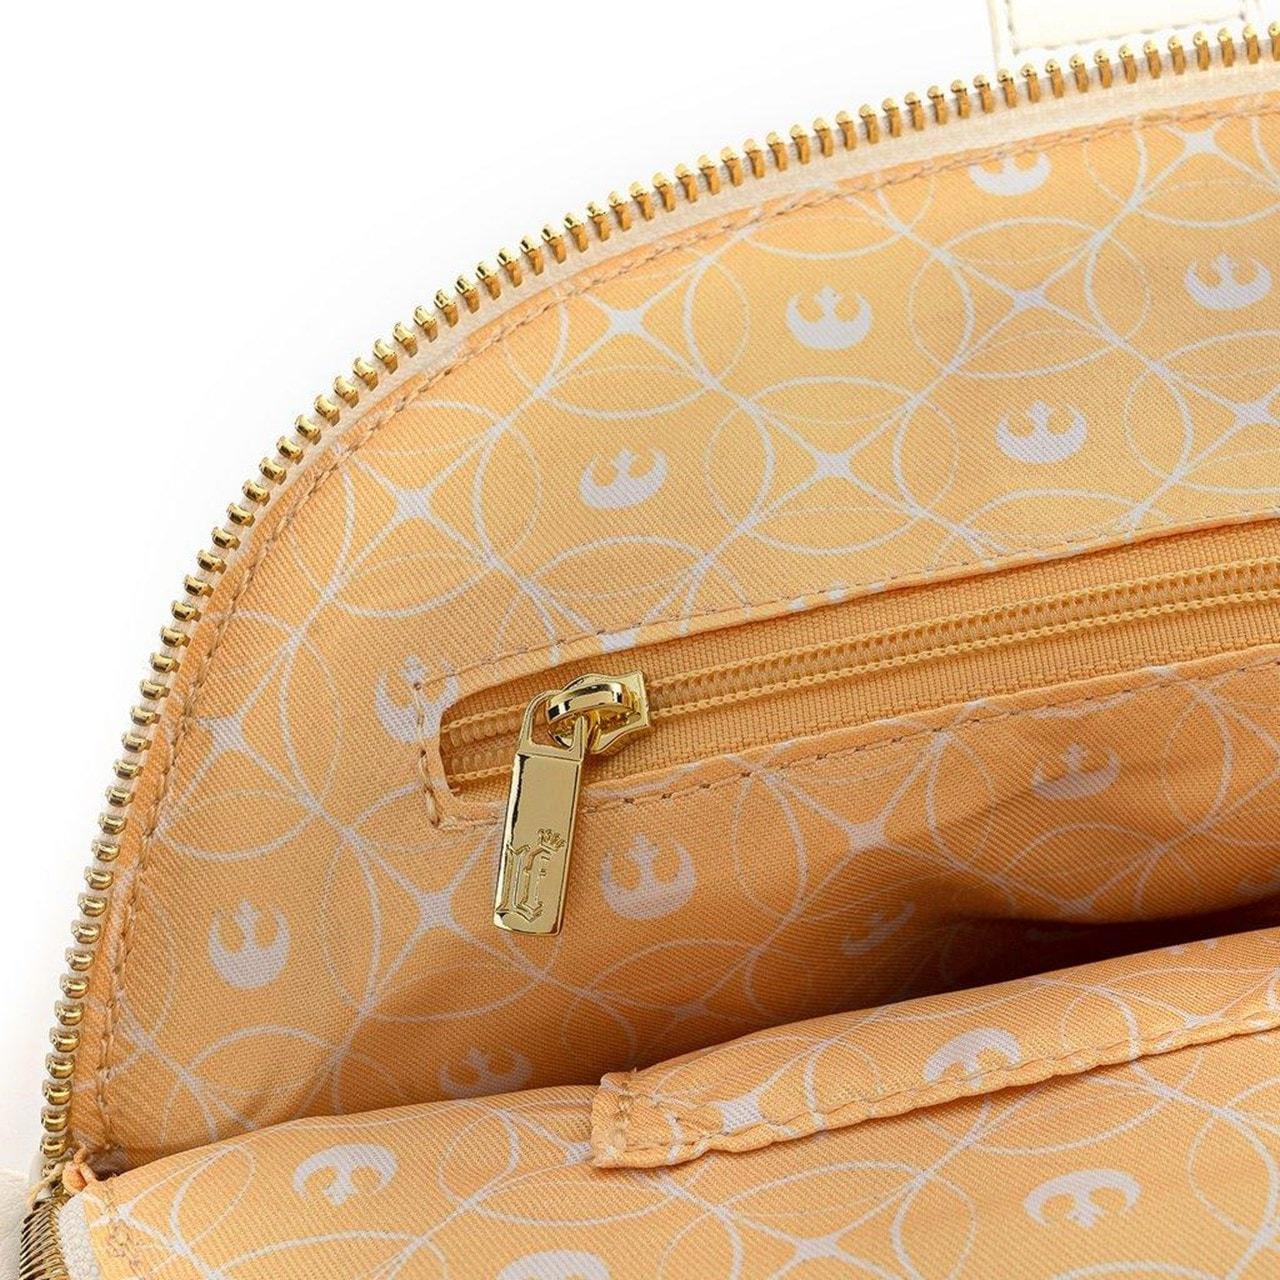 Loungefly X Star Wars White Rebel Handle Crossbody Bag - 6